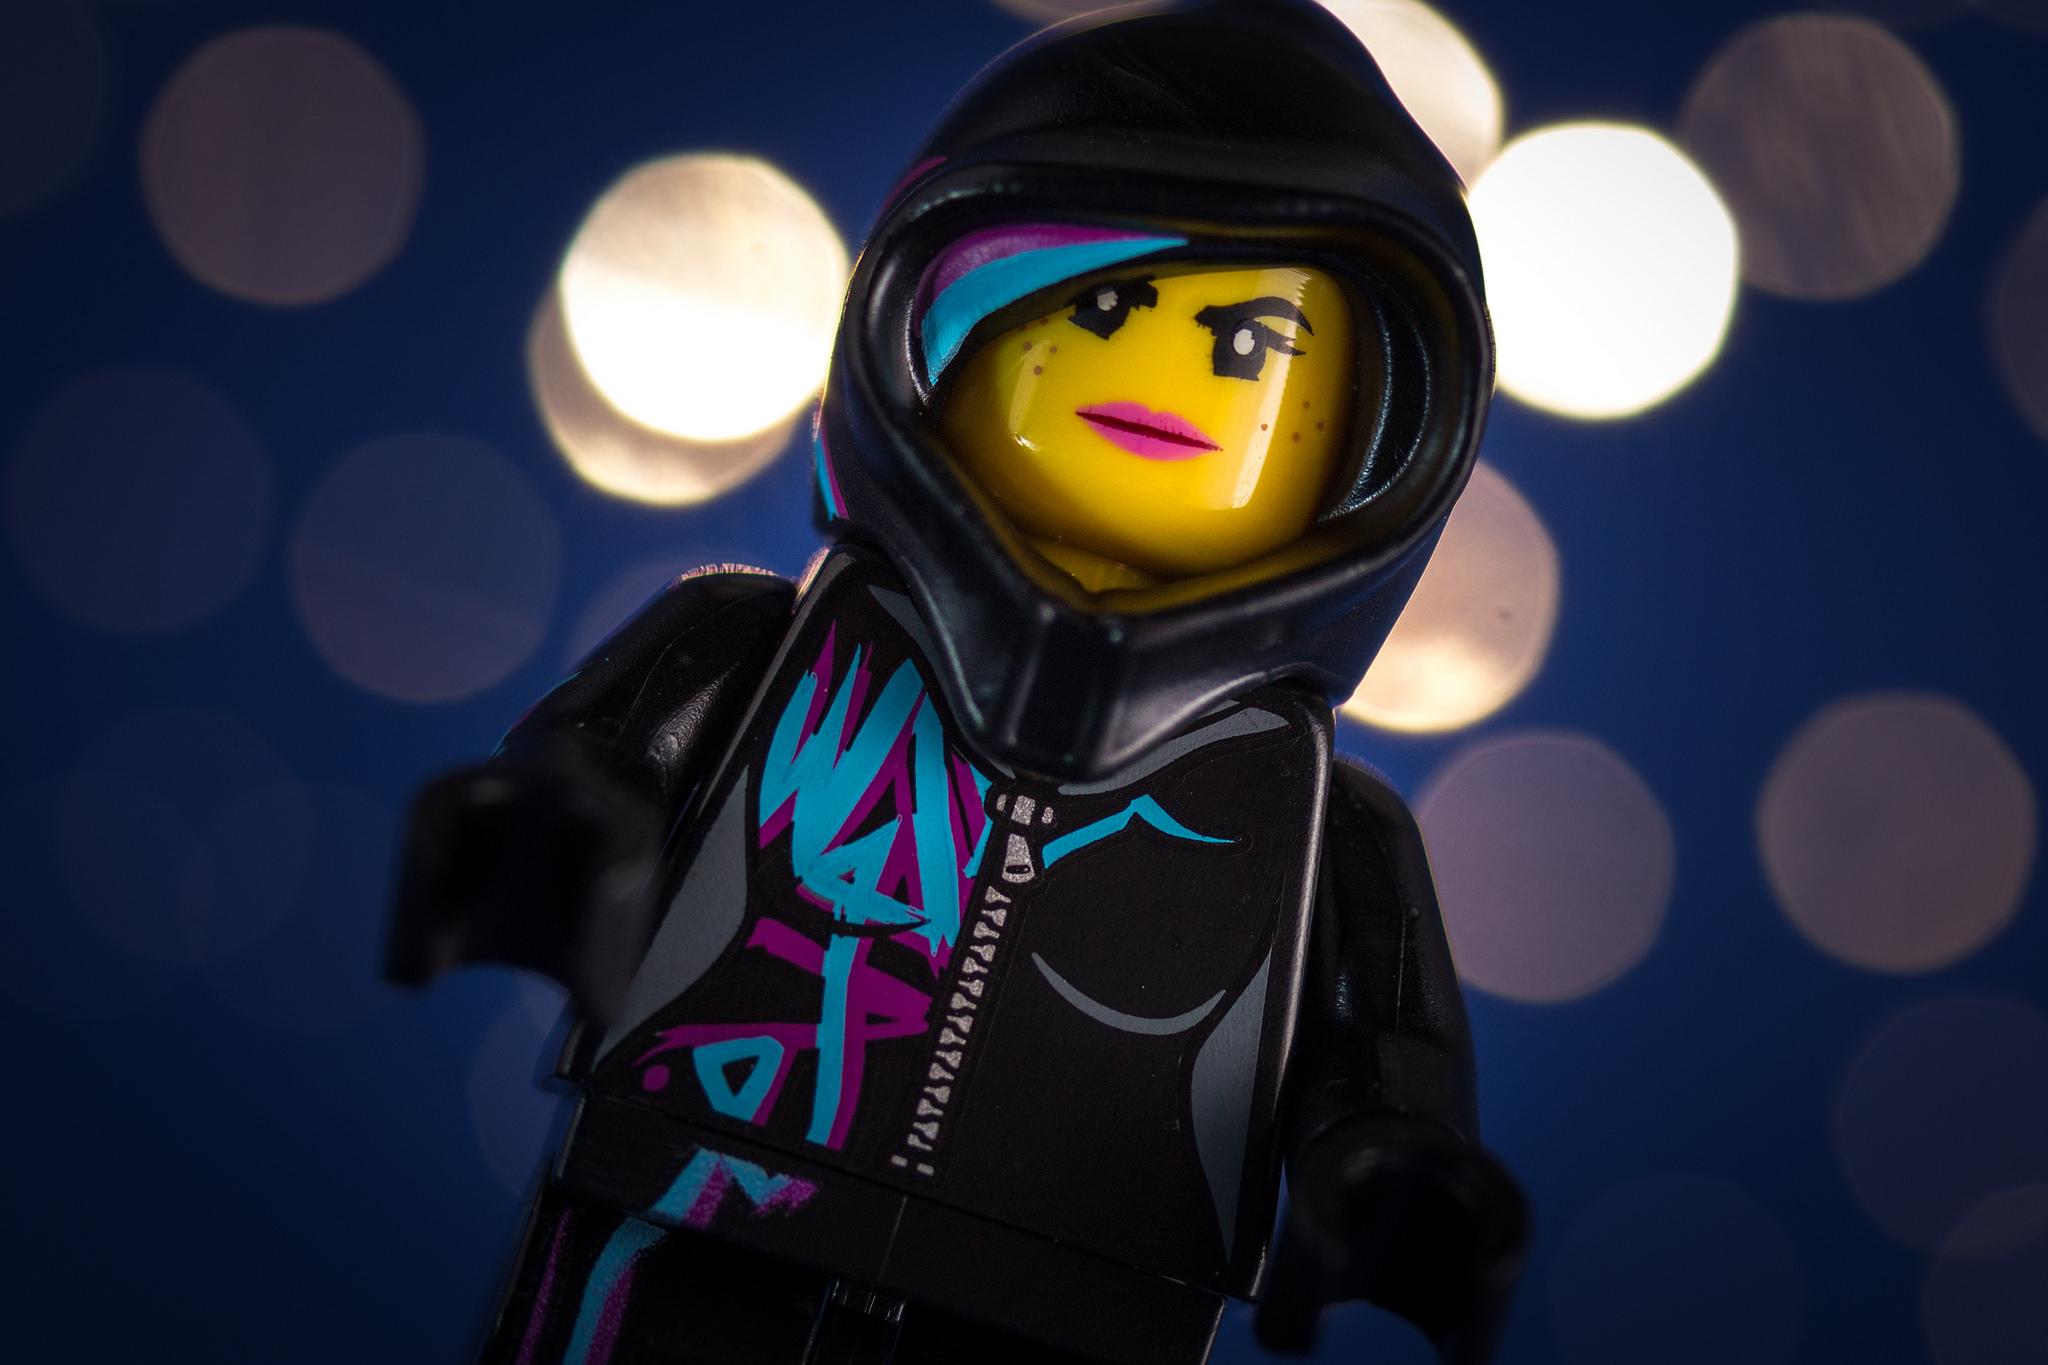 Lego Wildstyle